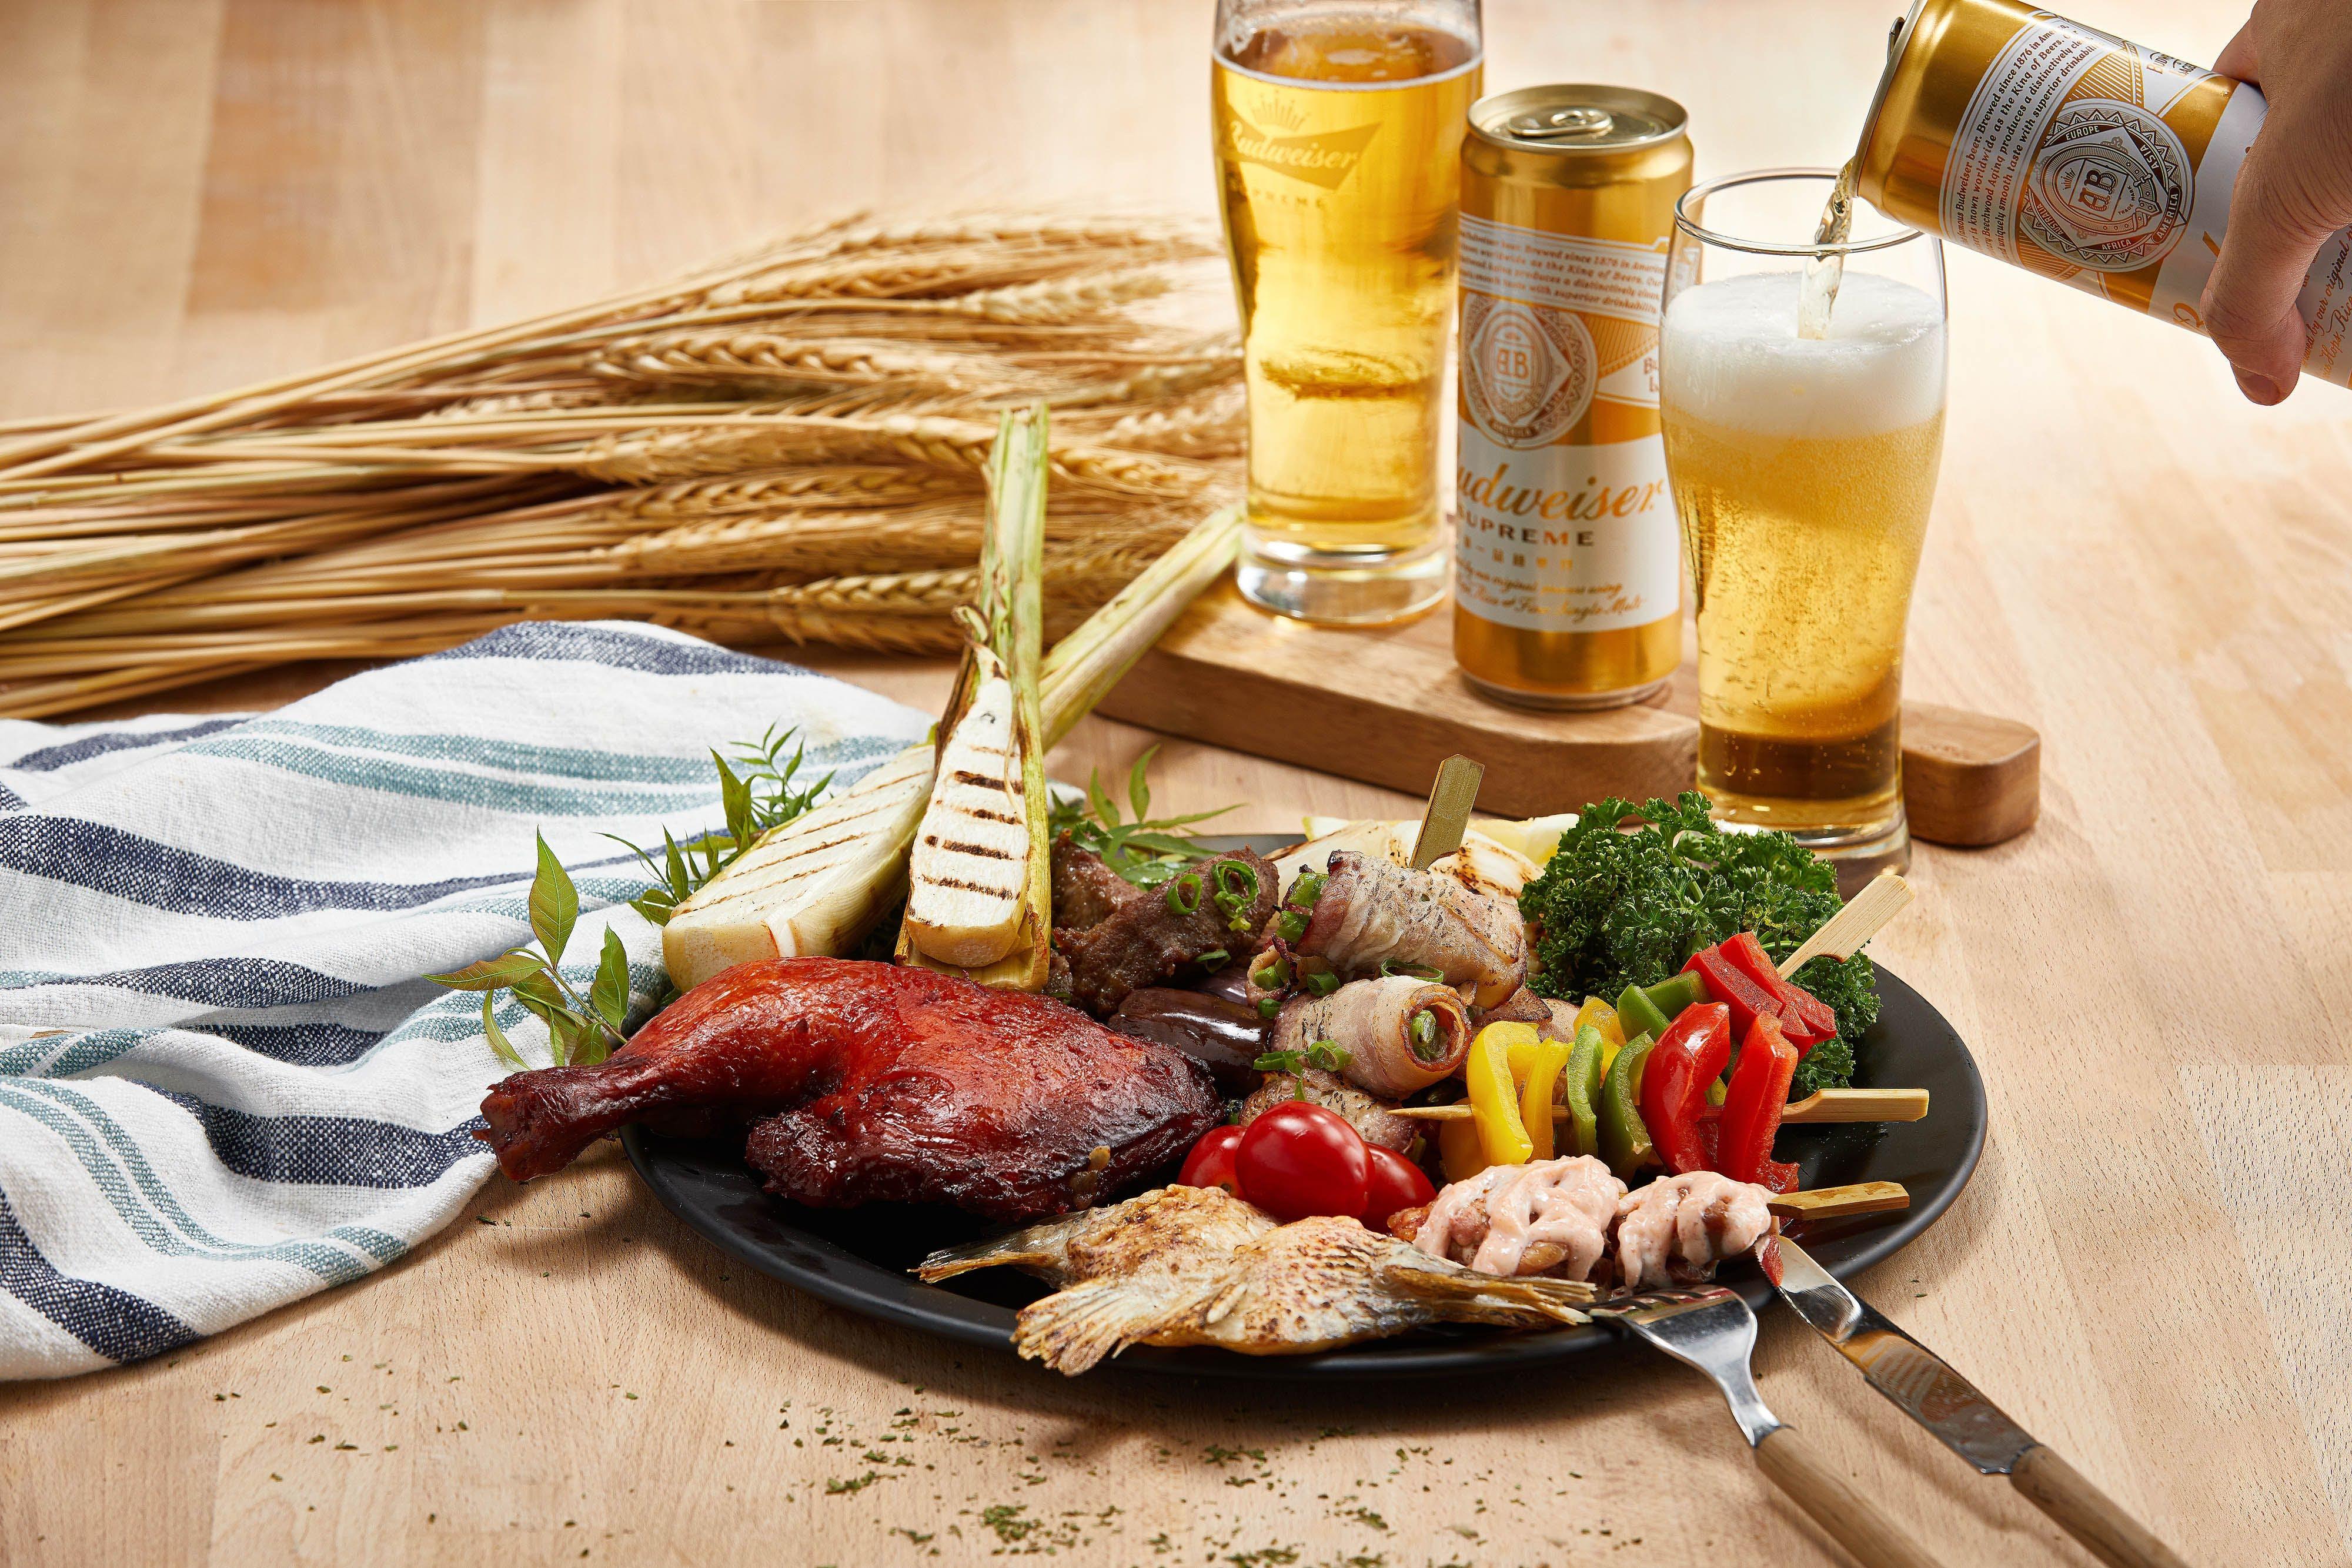 「MJ燒烤季」活動,可以享用豪邁肉料理和百威金尊啤酒無限暢飲。